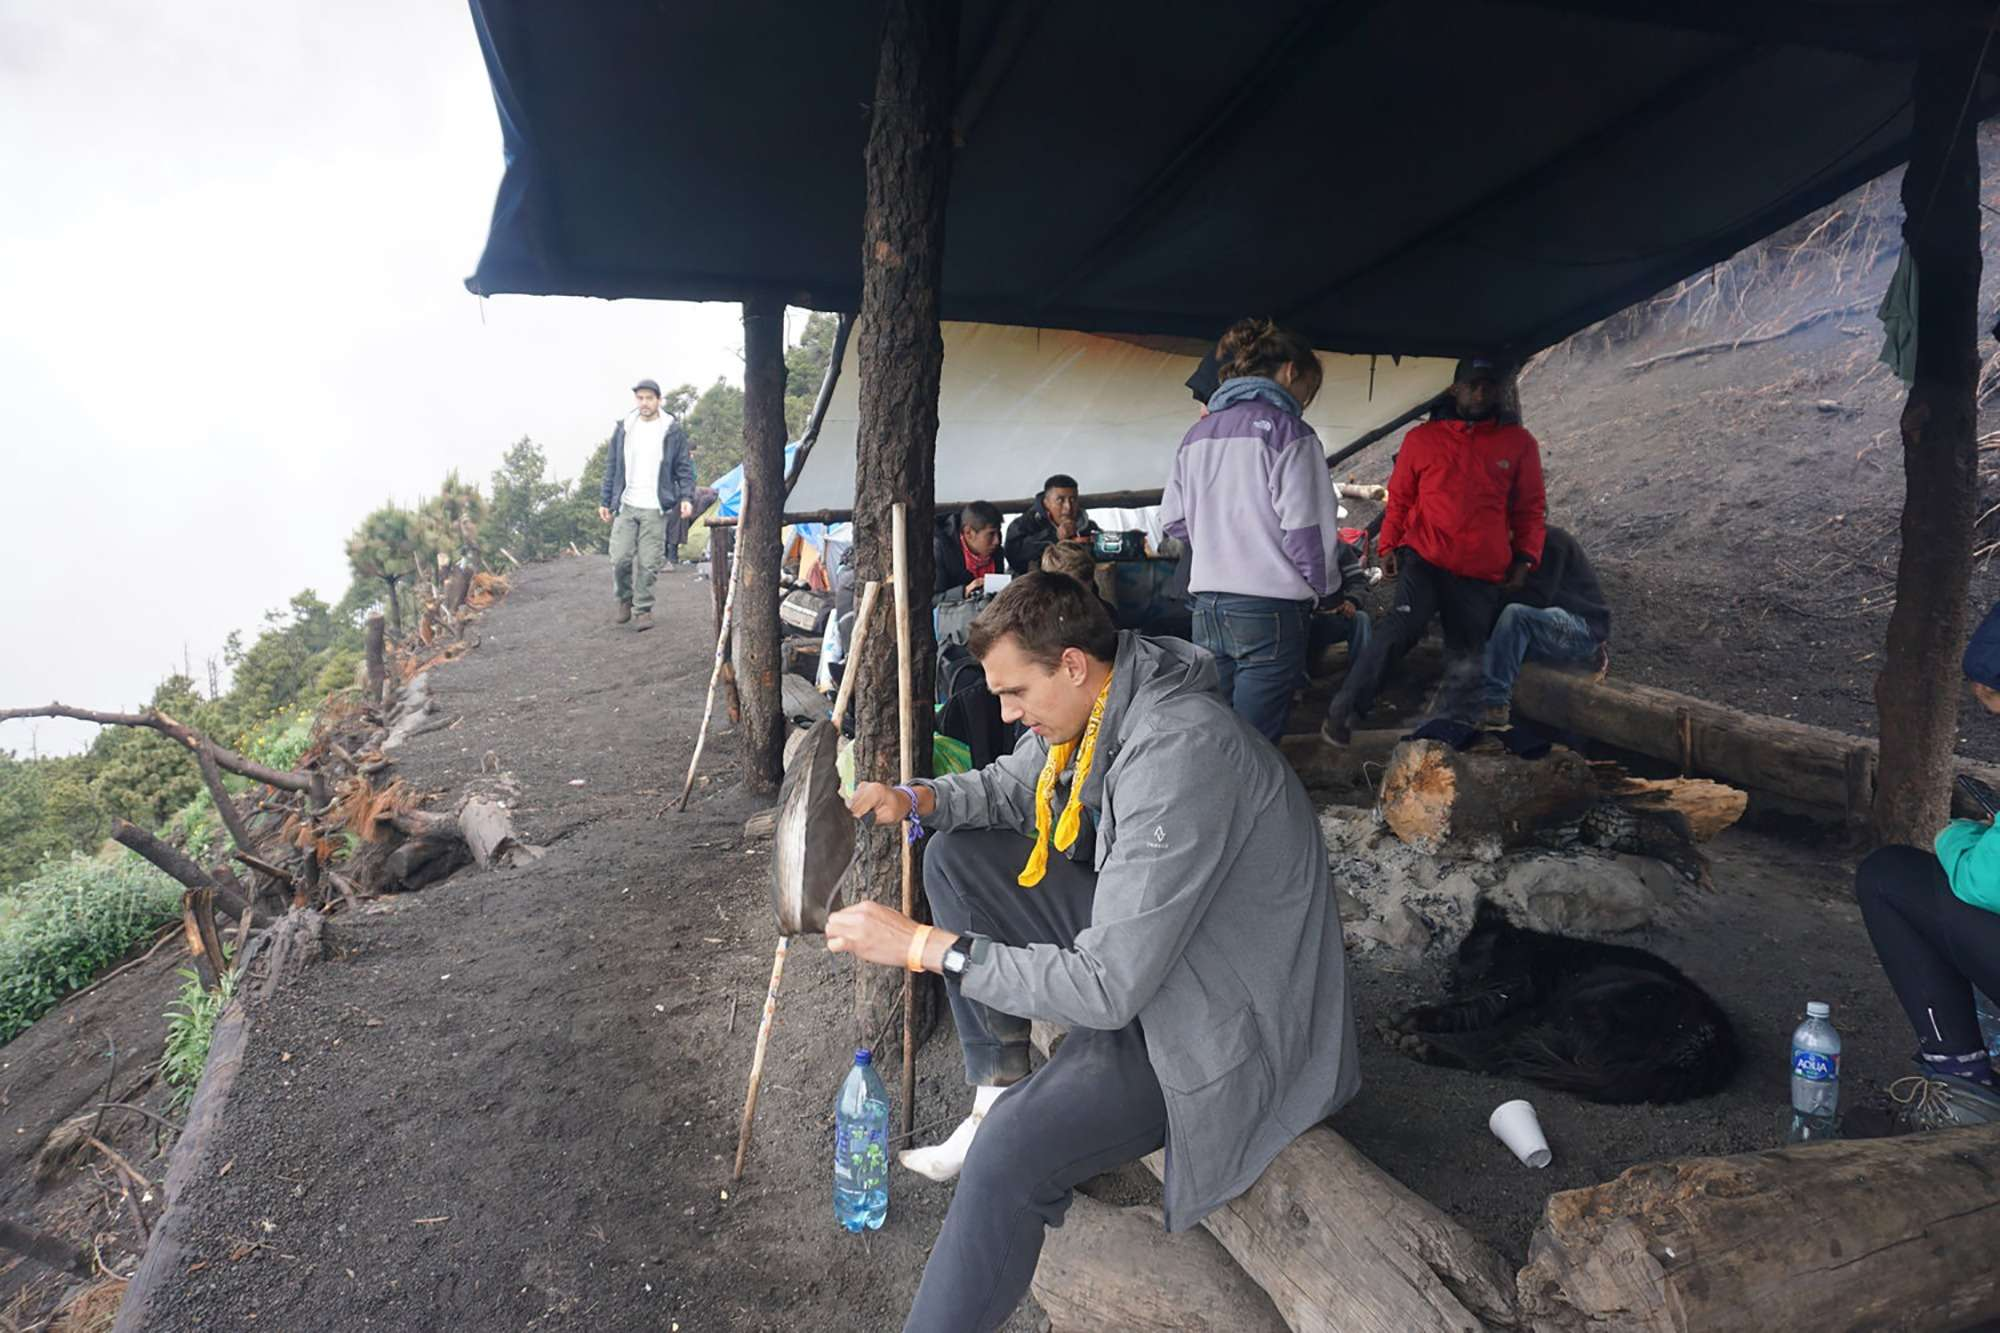 Hikers gather at base camp on volcano Acatenango